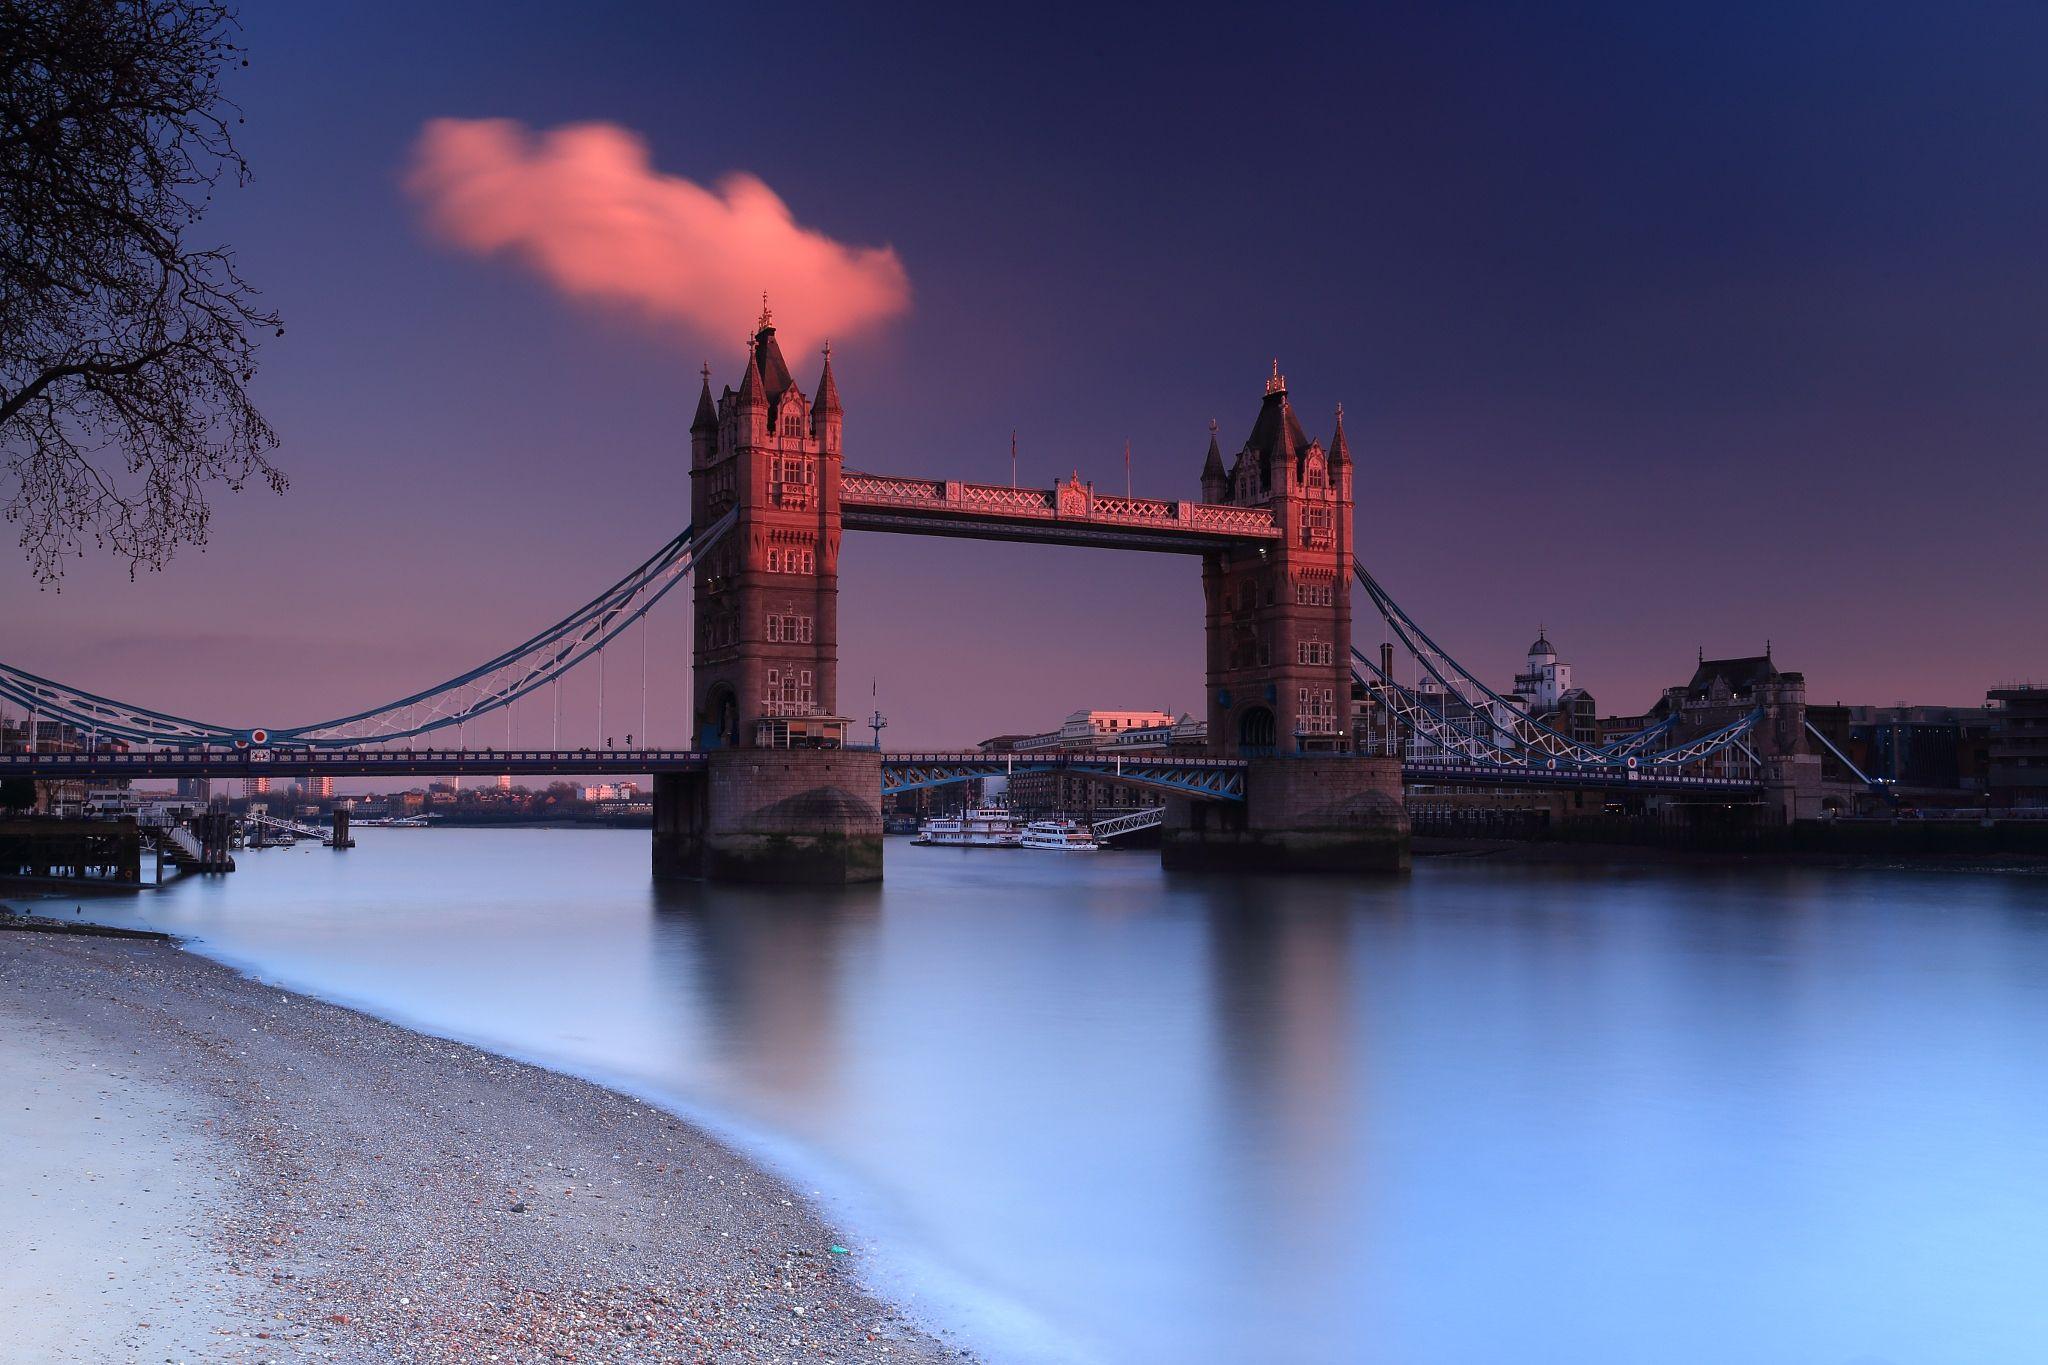 Tower Bridge Glow by Craig Davison on 500px